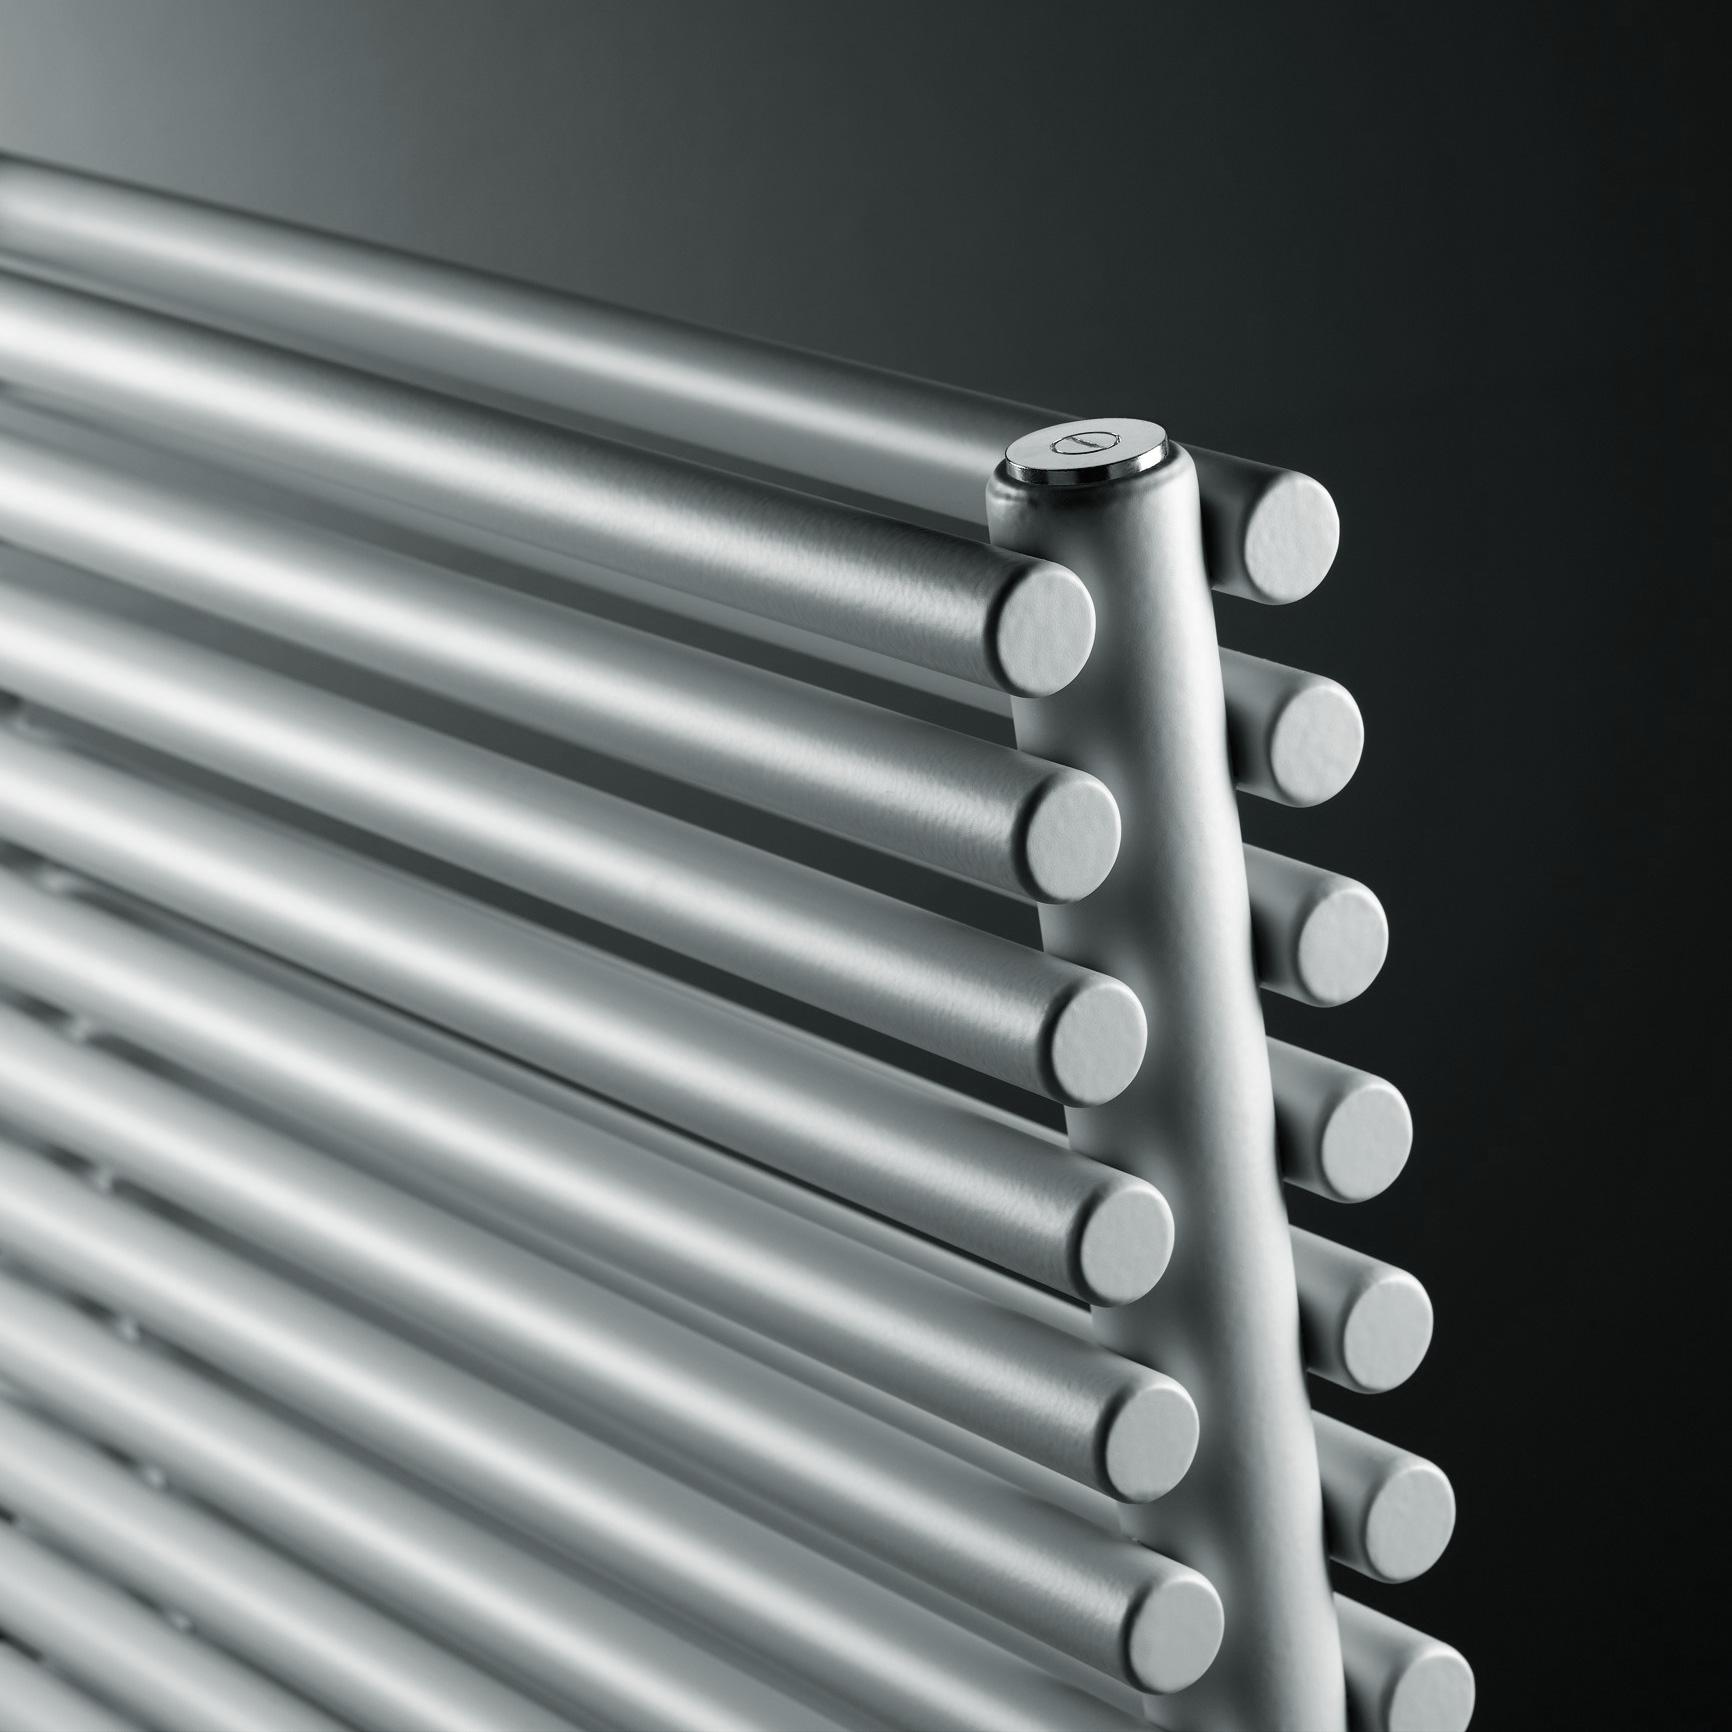 vasco agave hr2 heizk rper zweireihig breite 85 cm 1522. Black Bedroom Furniture Sets. Home Design Ideas